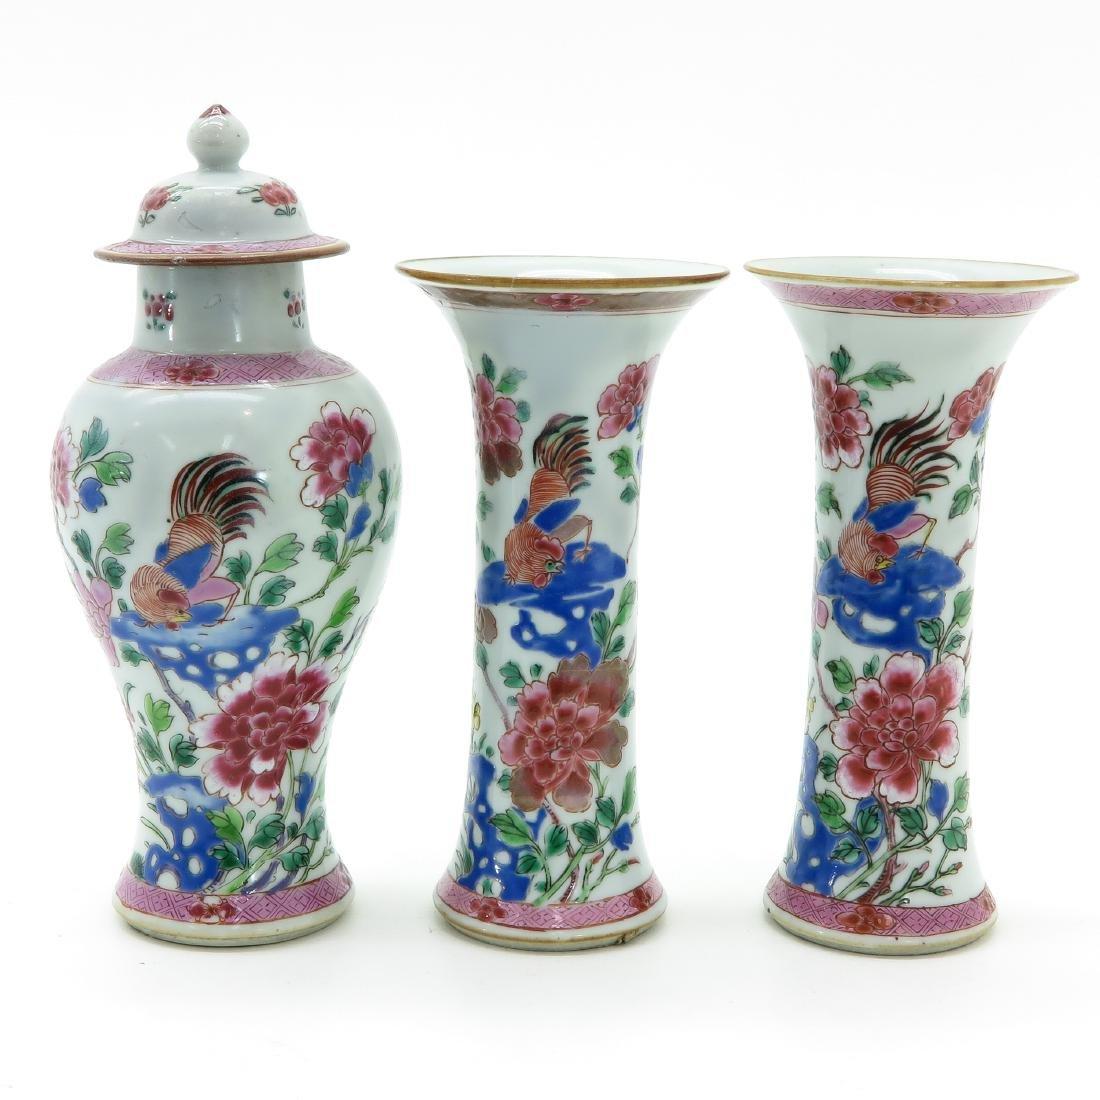 A Famille Rose Decor Three Piece Garniture Set